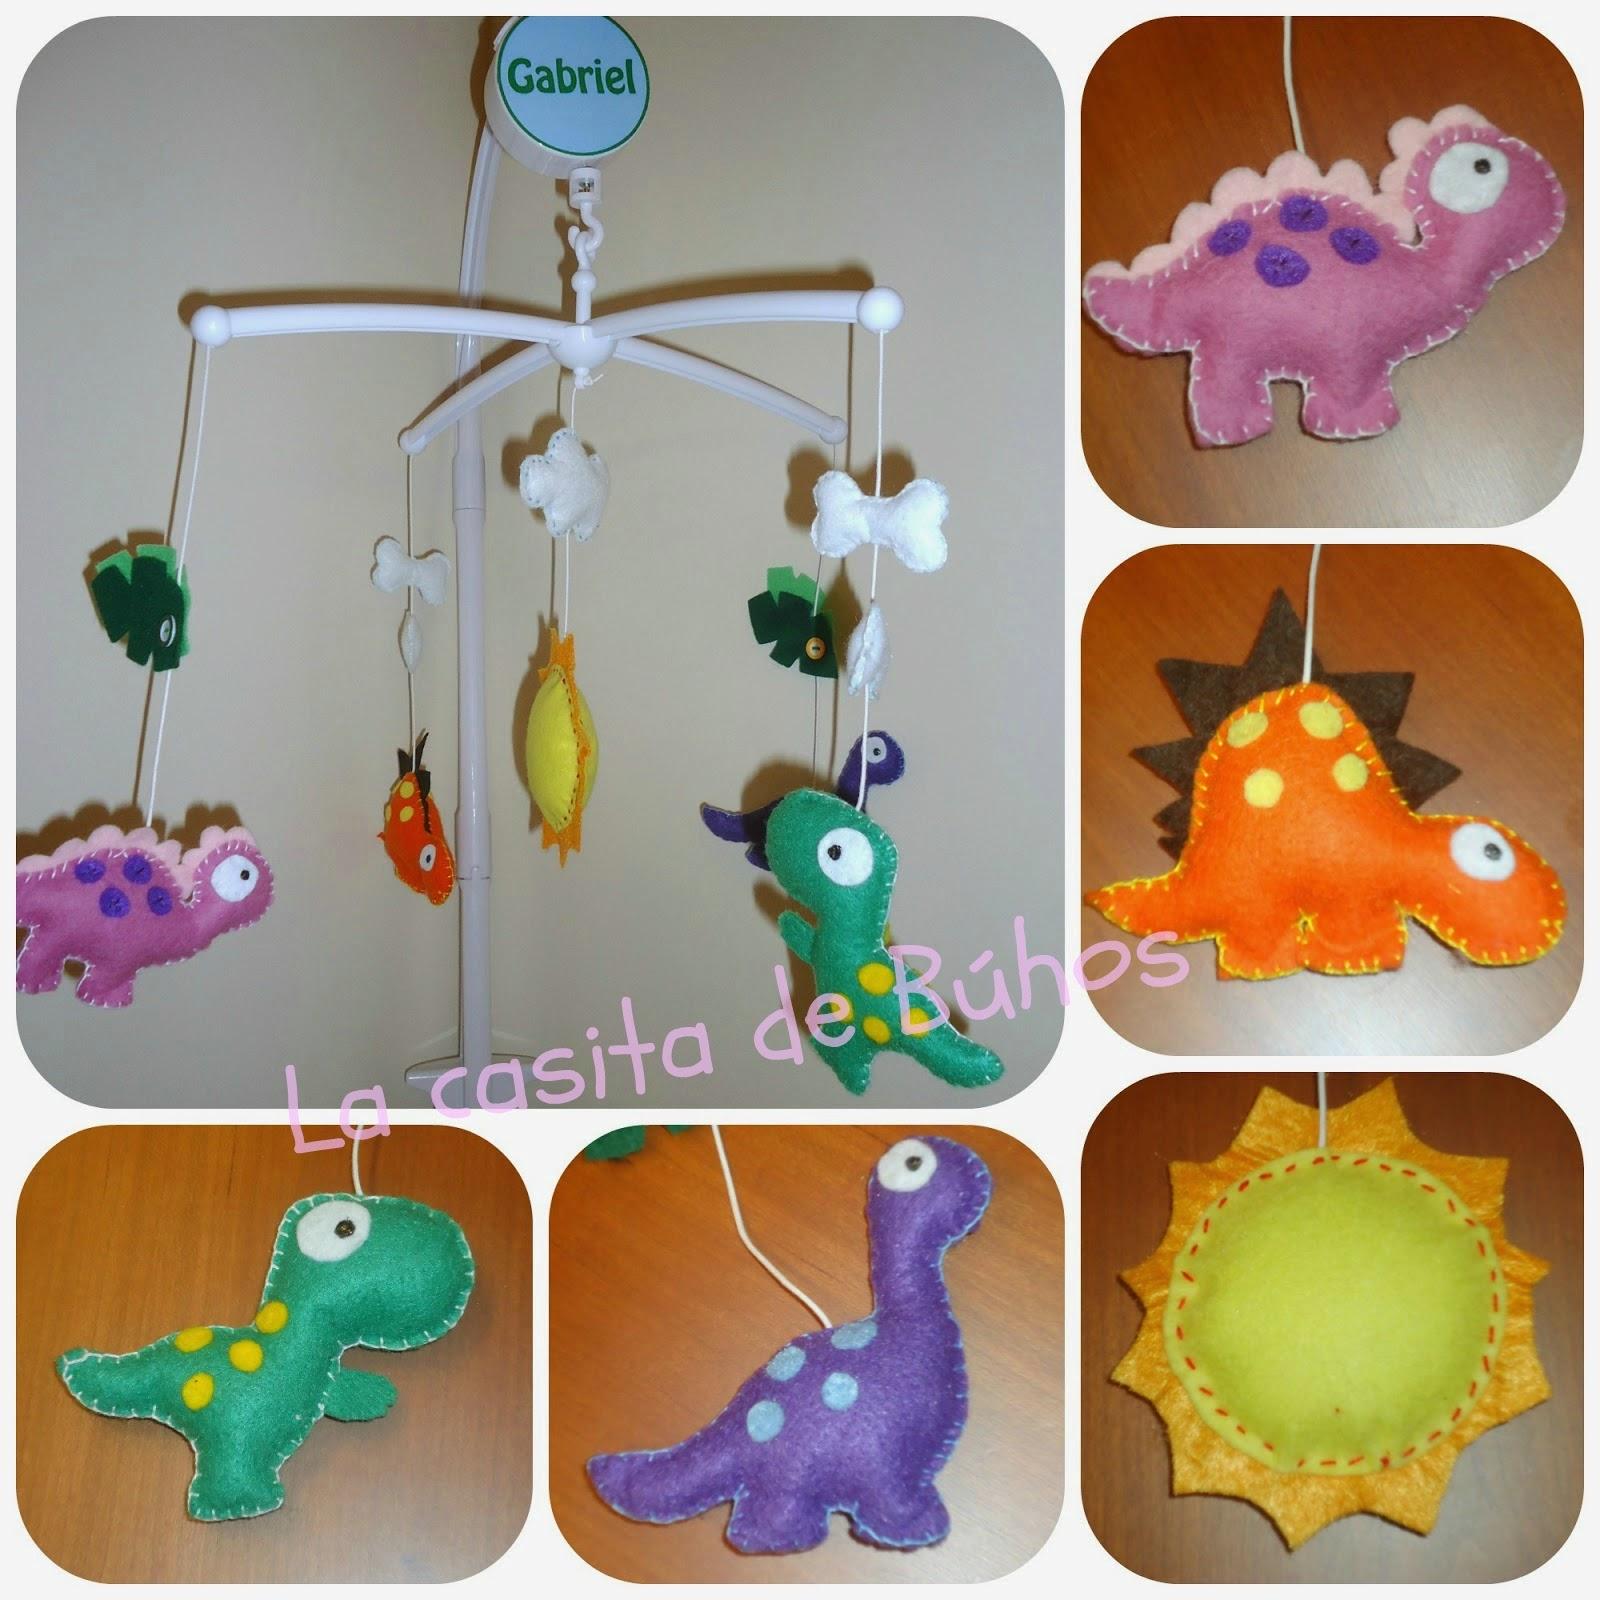 Móvil cuna dinosaurios - Crib mobile dinosaurs